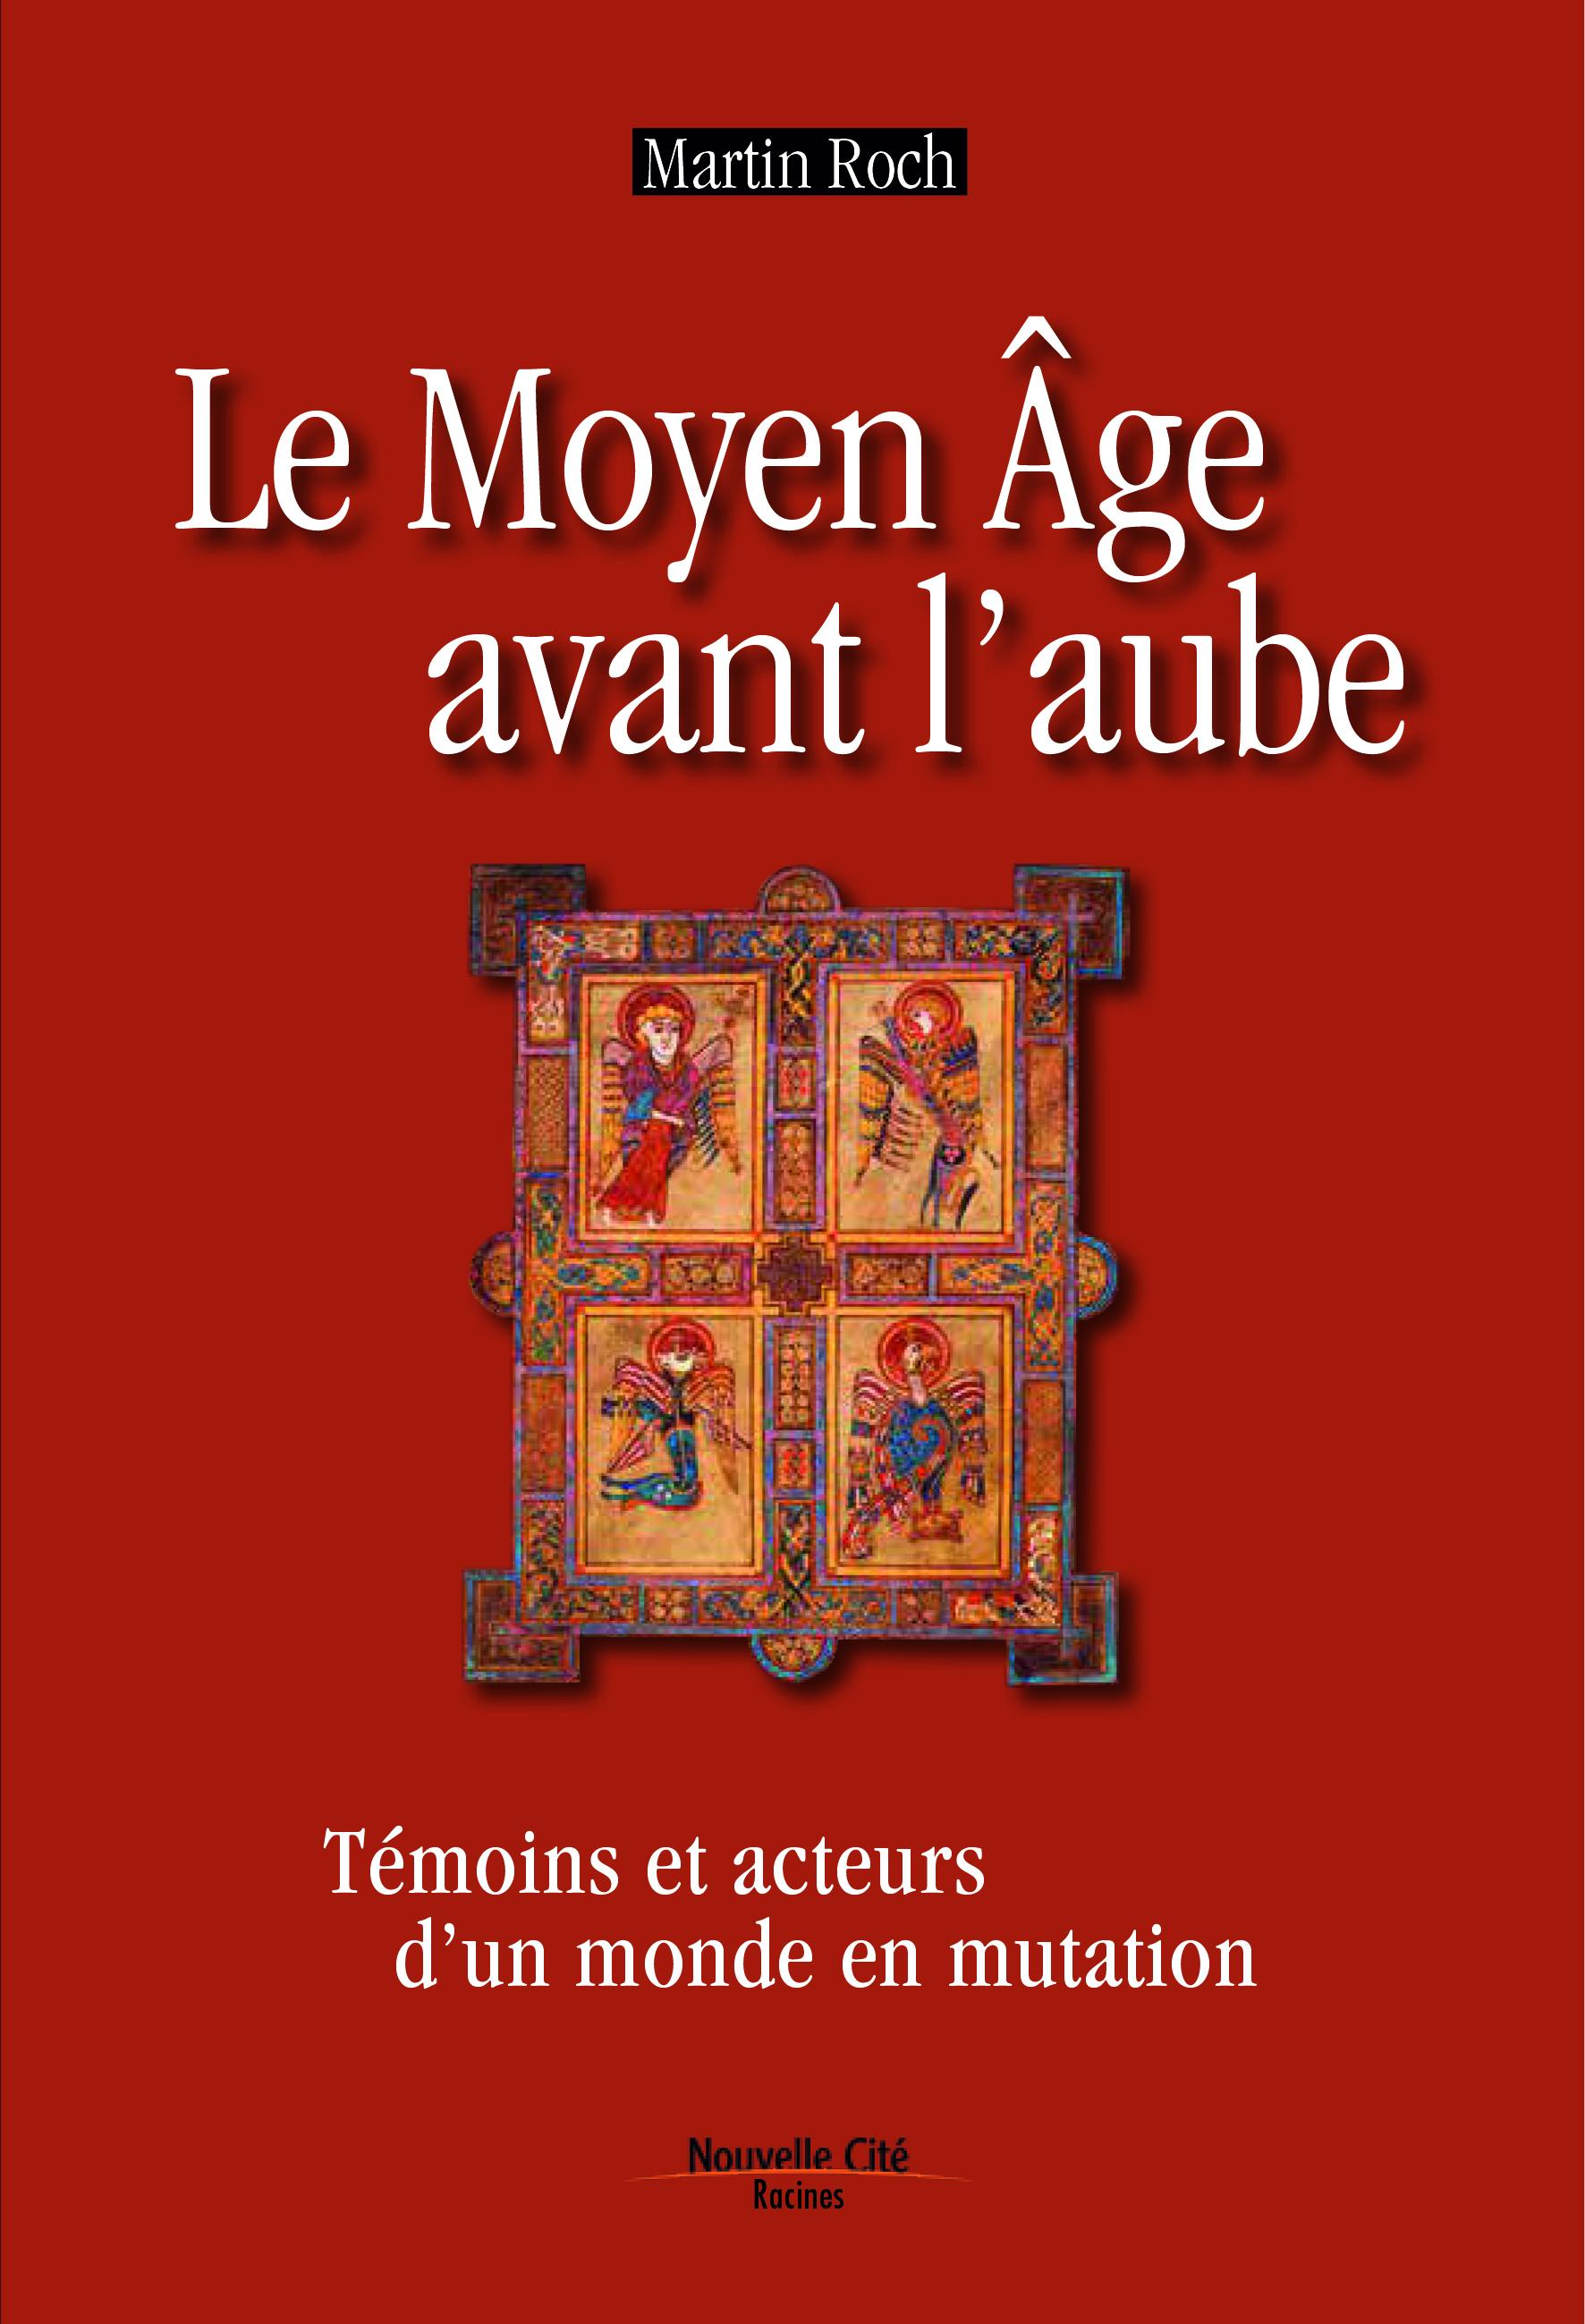 le_moyen_age_avant_l_aube_couv1_hd.jpg